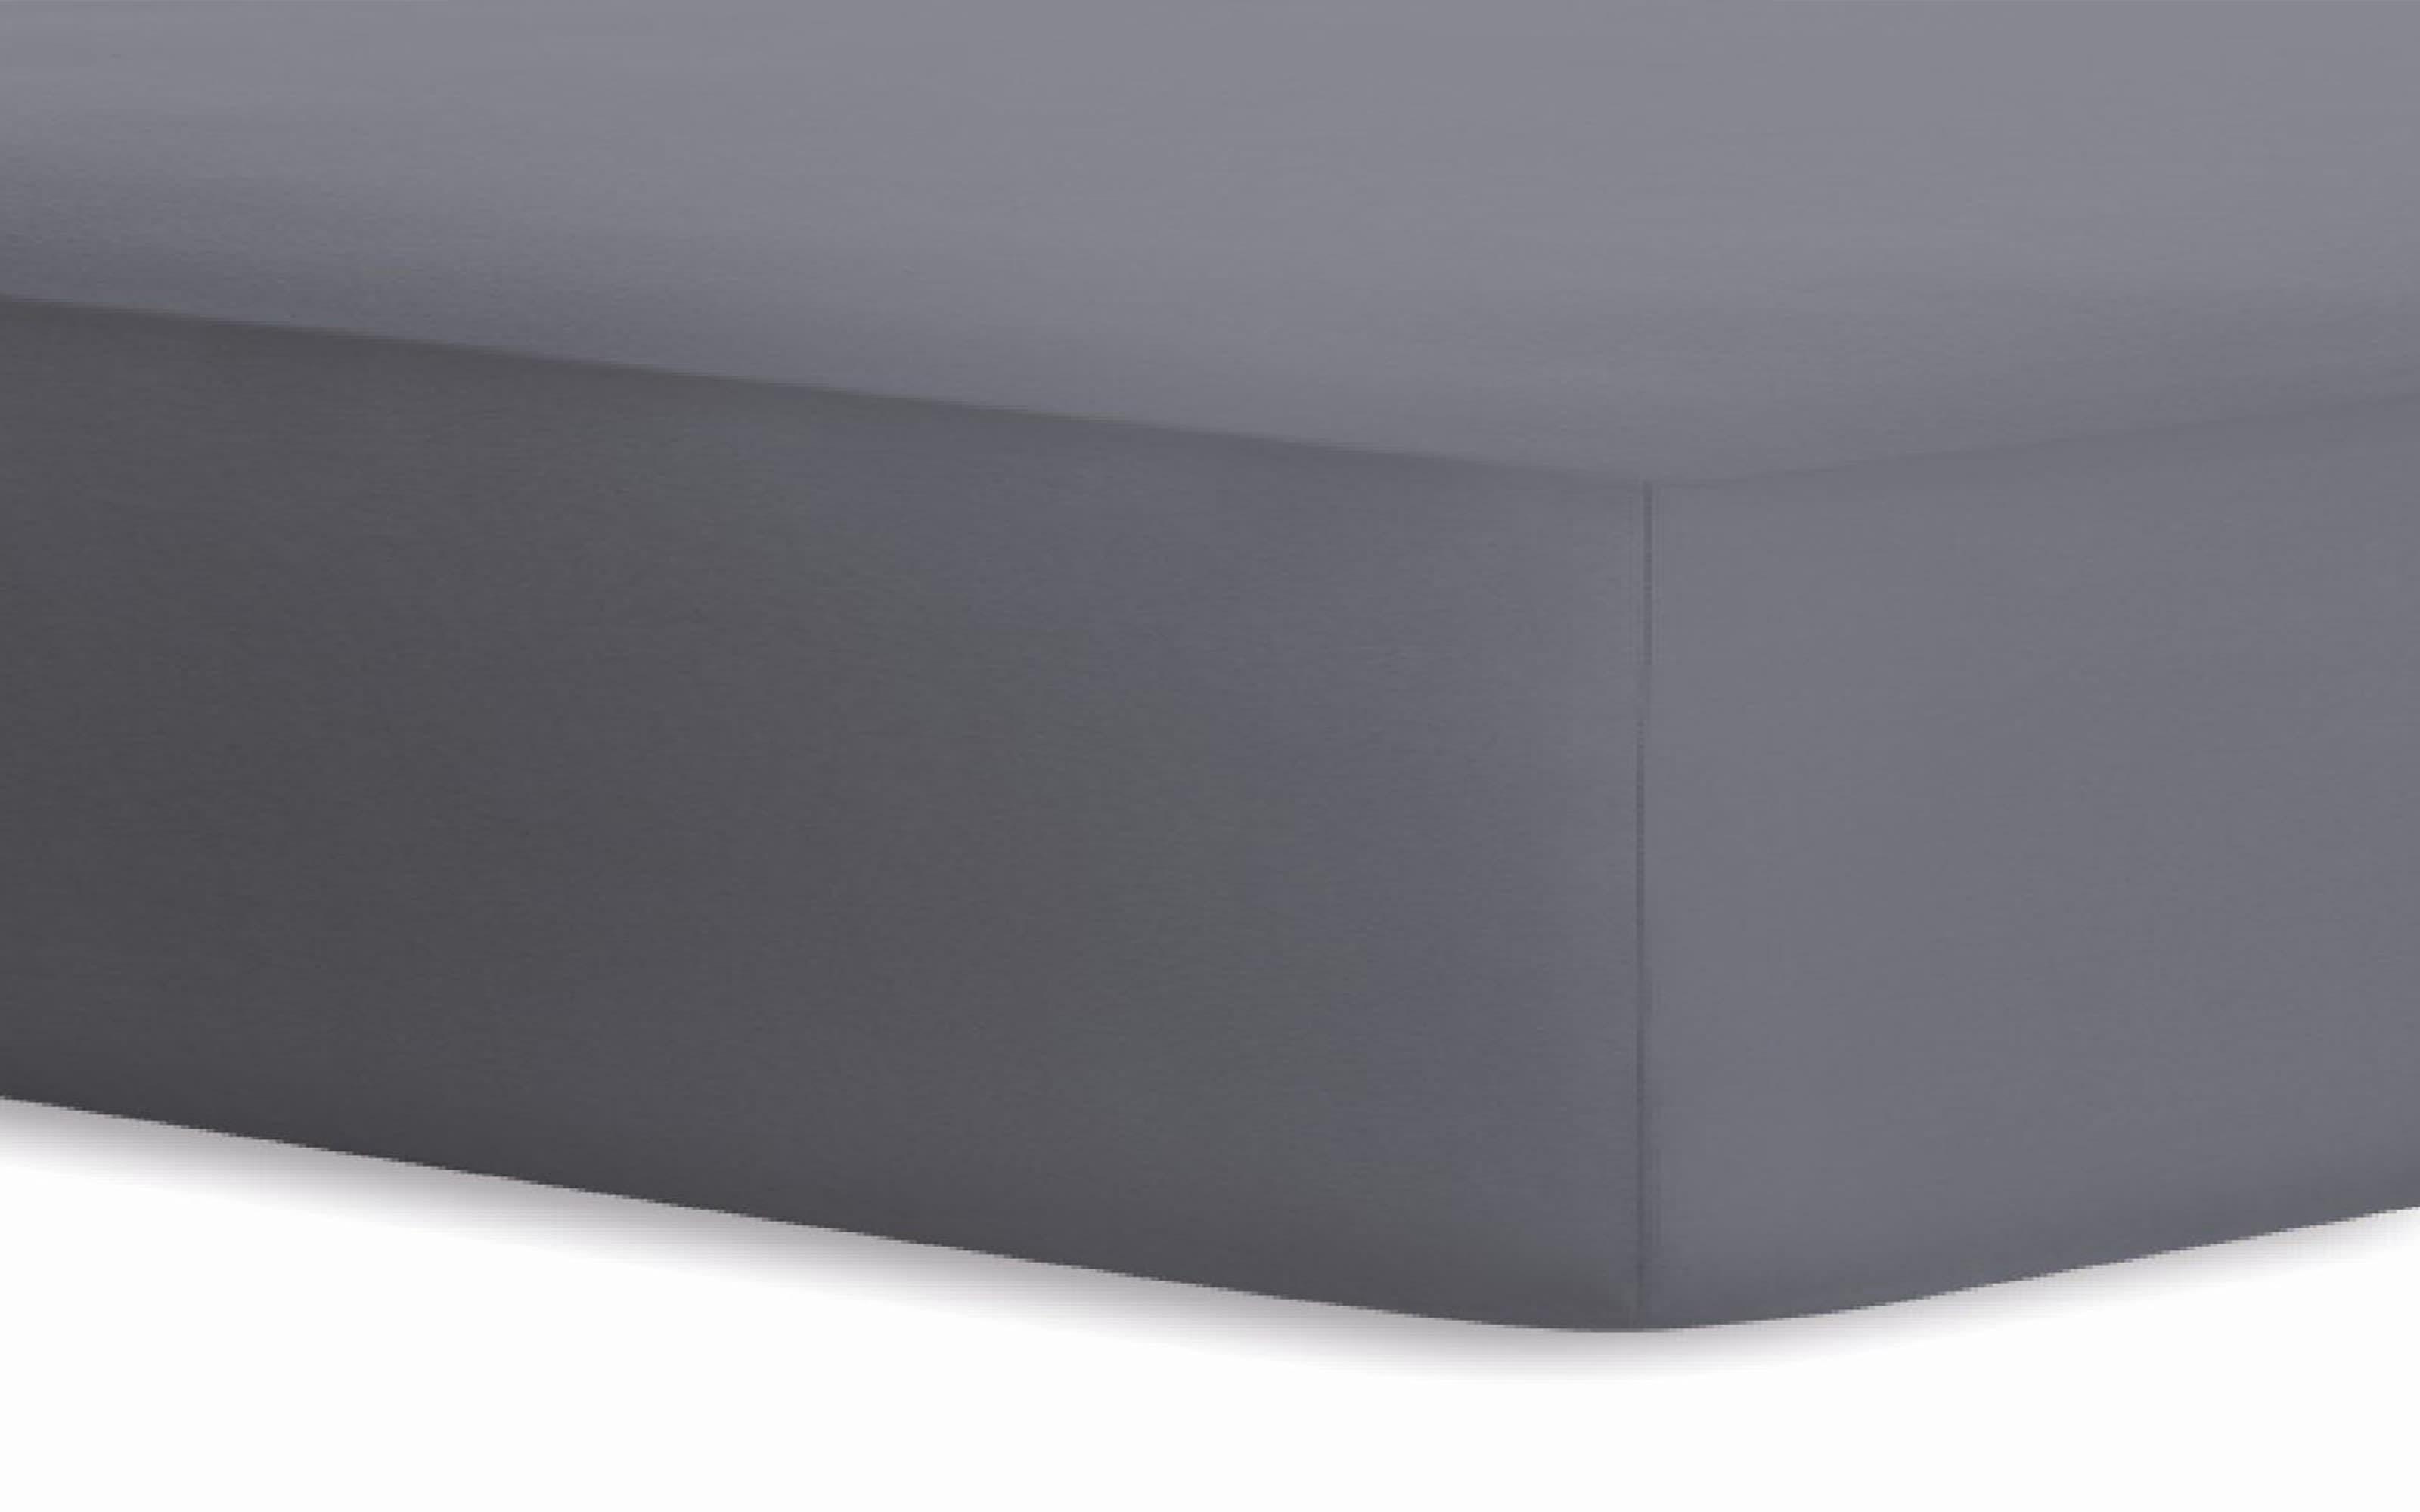 Boxspringspannbetttuch Jersey-Elasthan in graphit, 120 x 200 x 40 cm